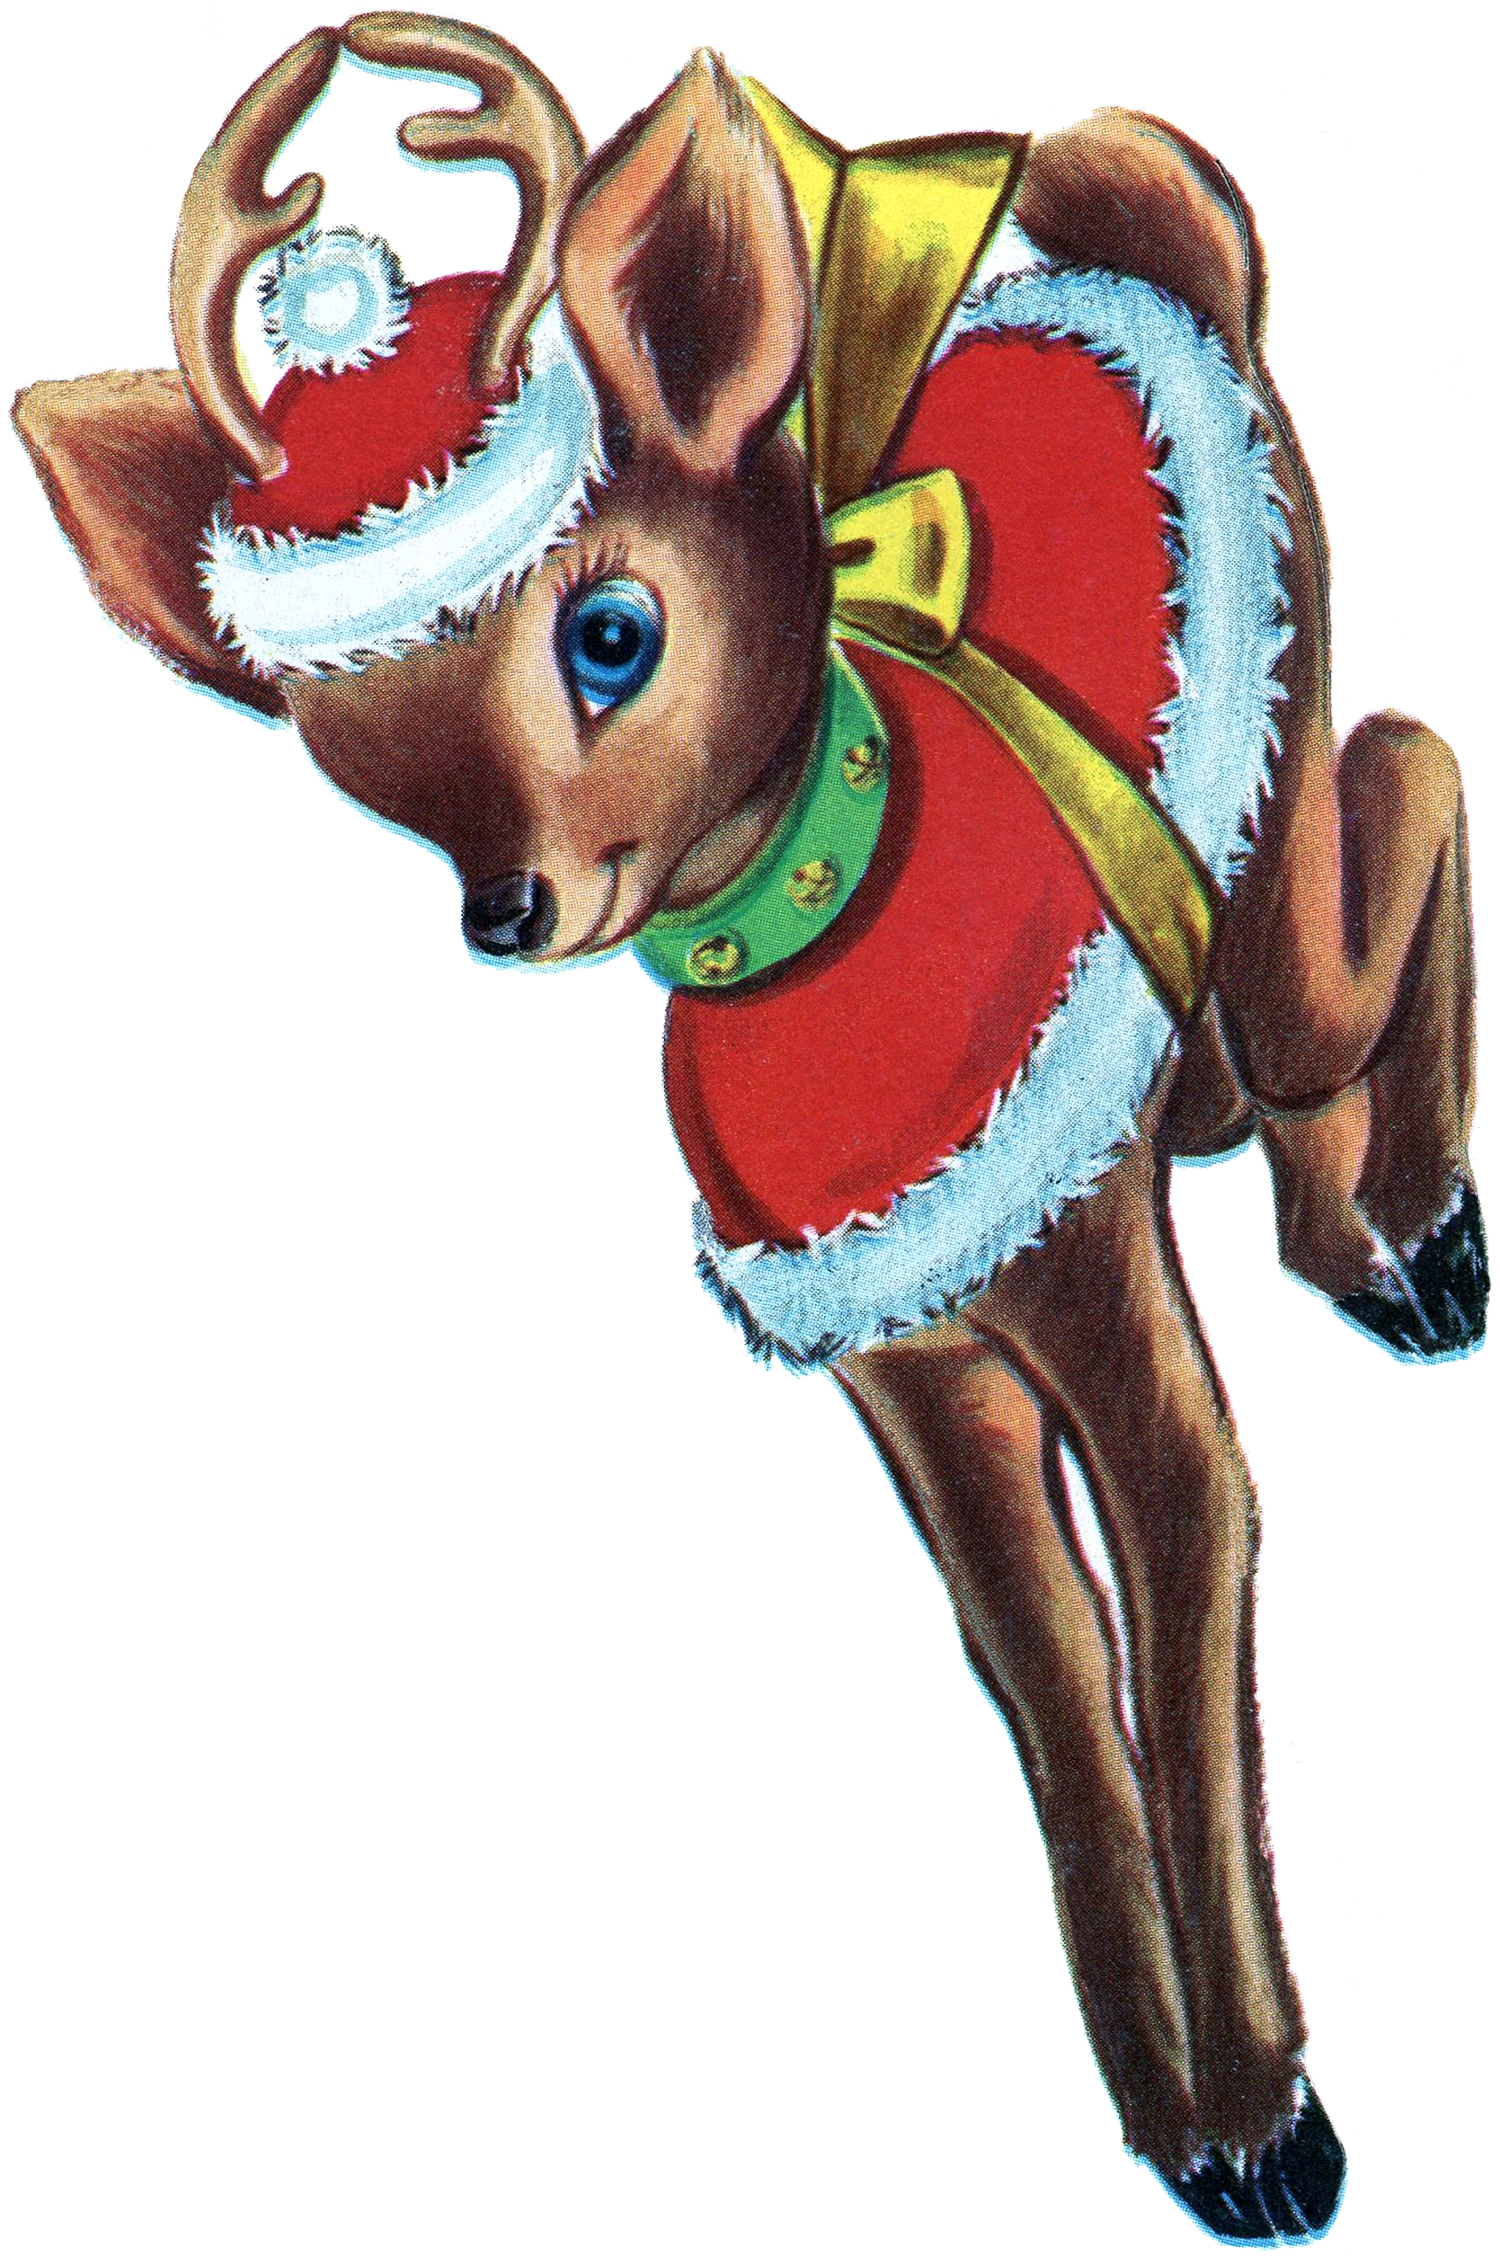 retro christmas reindeer image - Christmas Reindeer